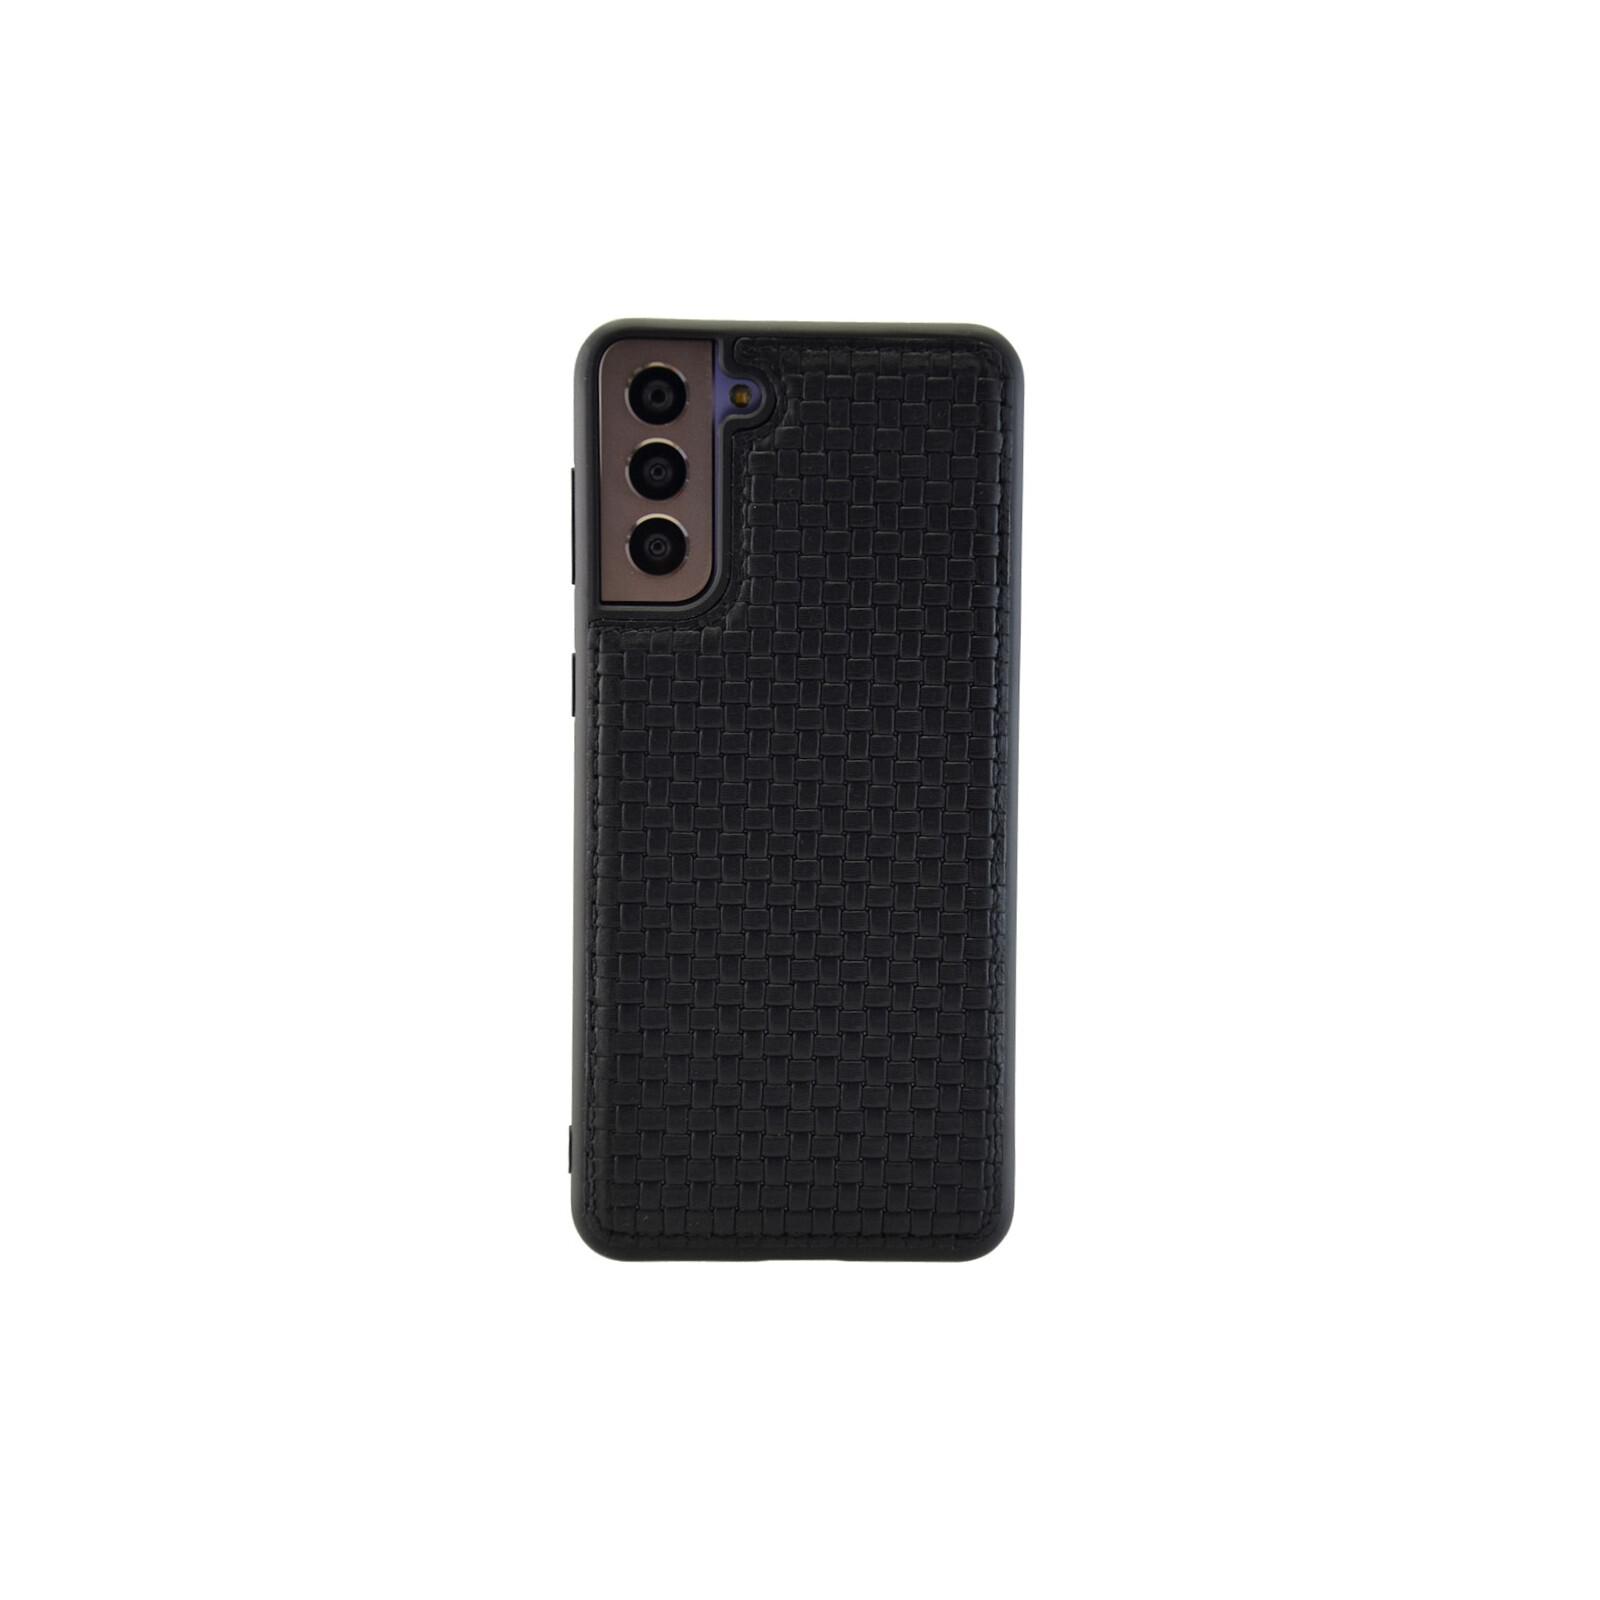 Galeli Back VITO Samsung Galaxy S21+ classy black